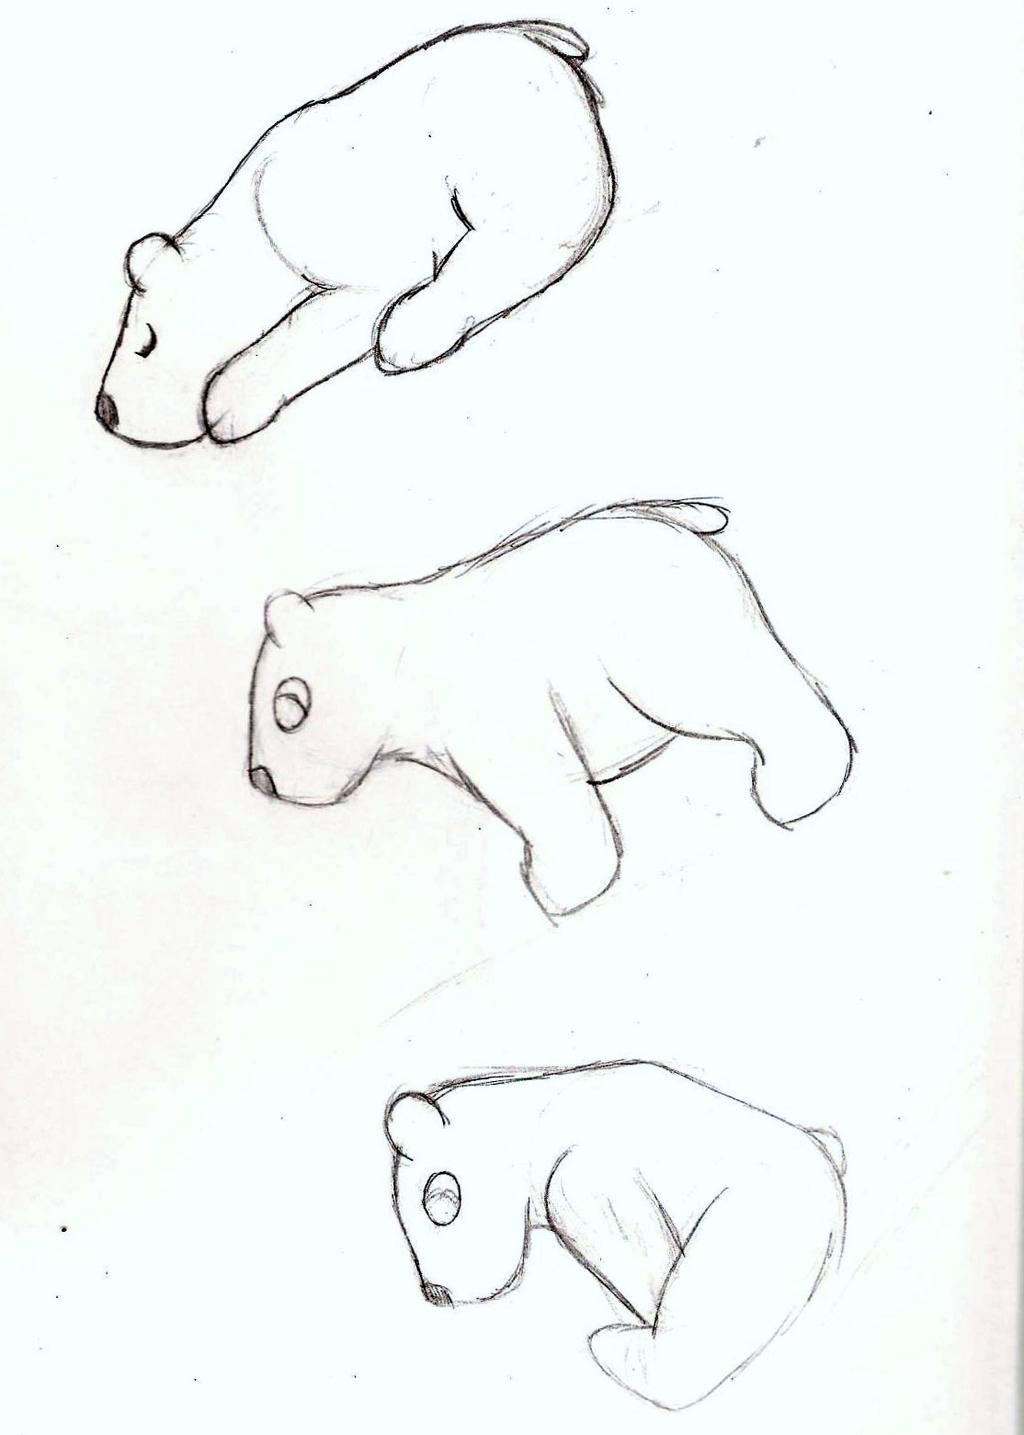 chibi polar bear poses by wh chicka 999 on deviantart